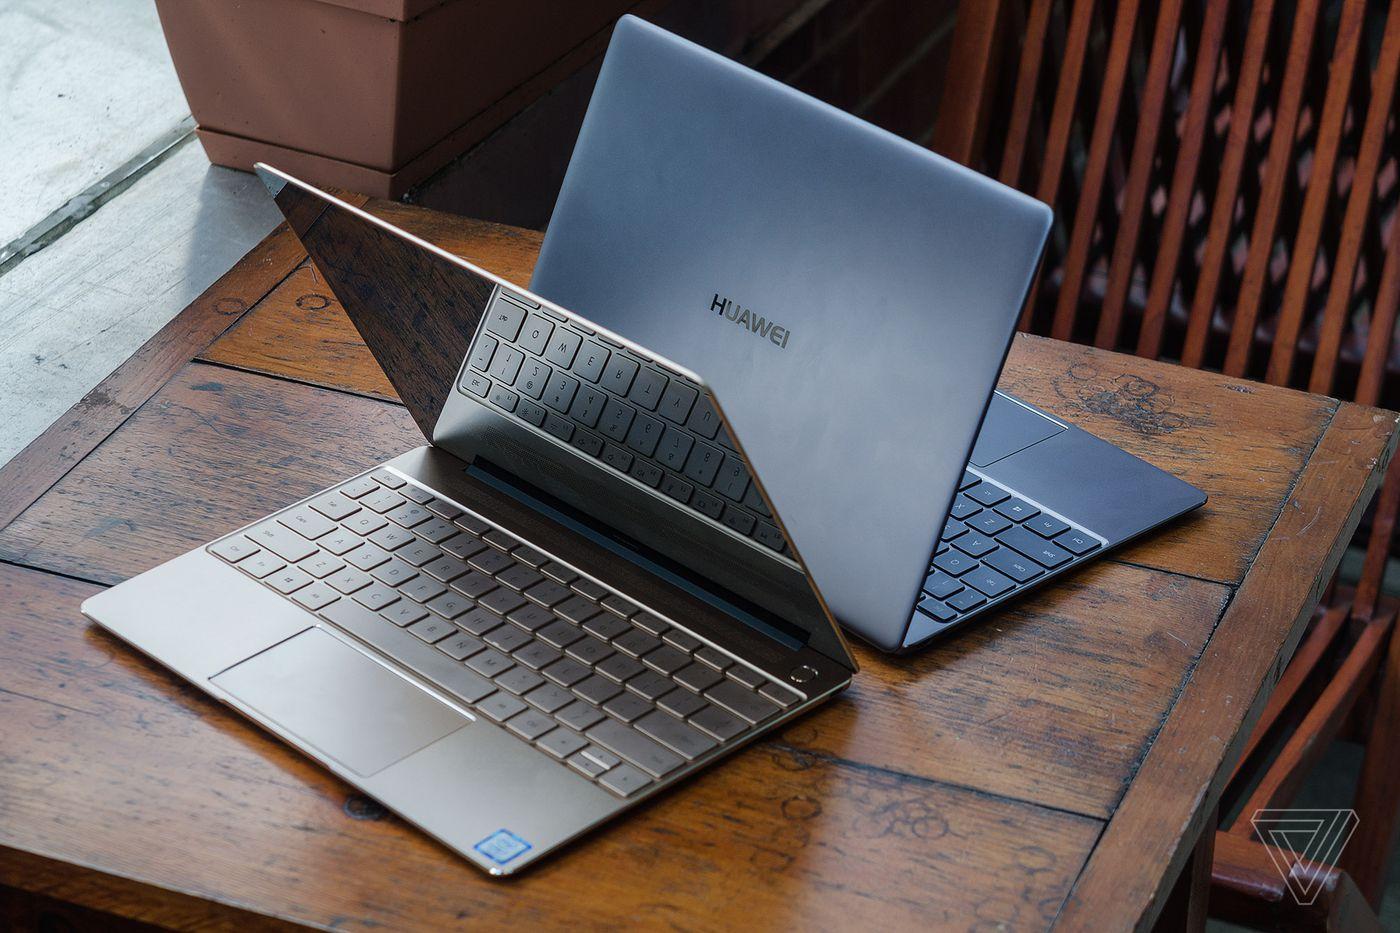 huawei ultrabook. huawei\u0027s new matebook laptops start at $1,000, preorders begin june 30th - the verge huawei ultrabook